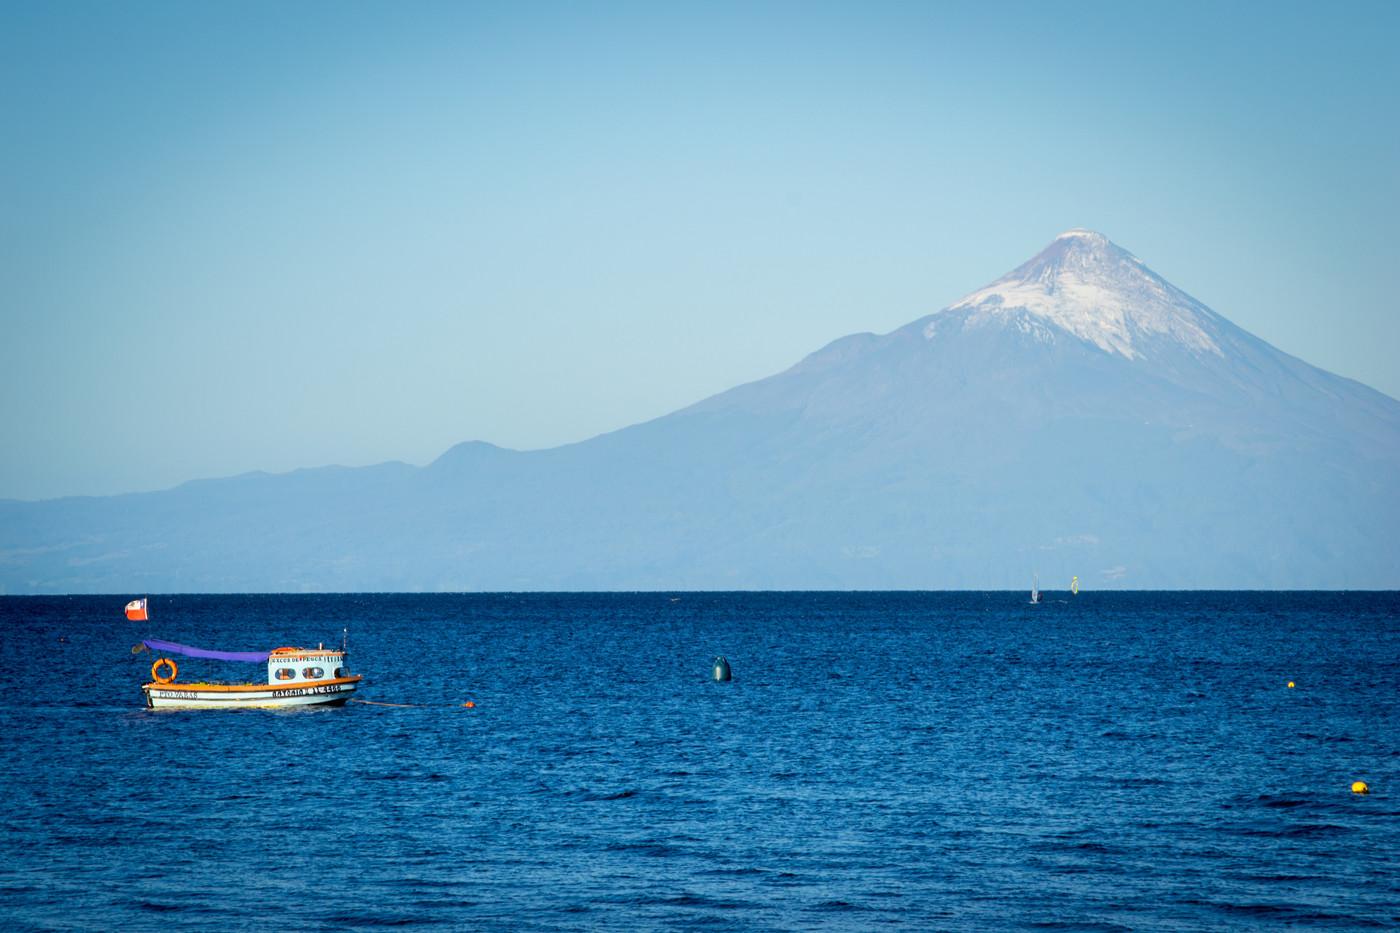 Puero Varas, Chile